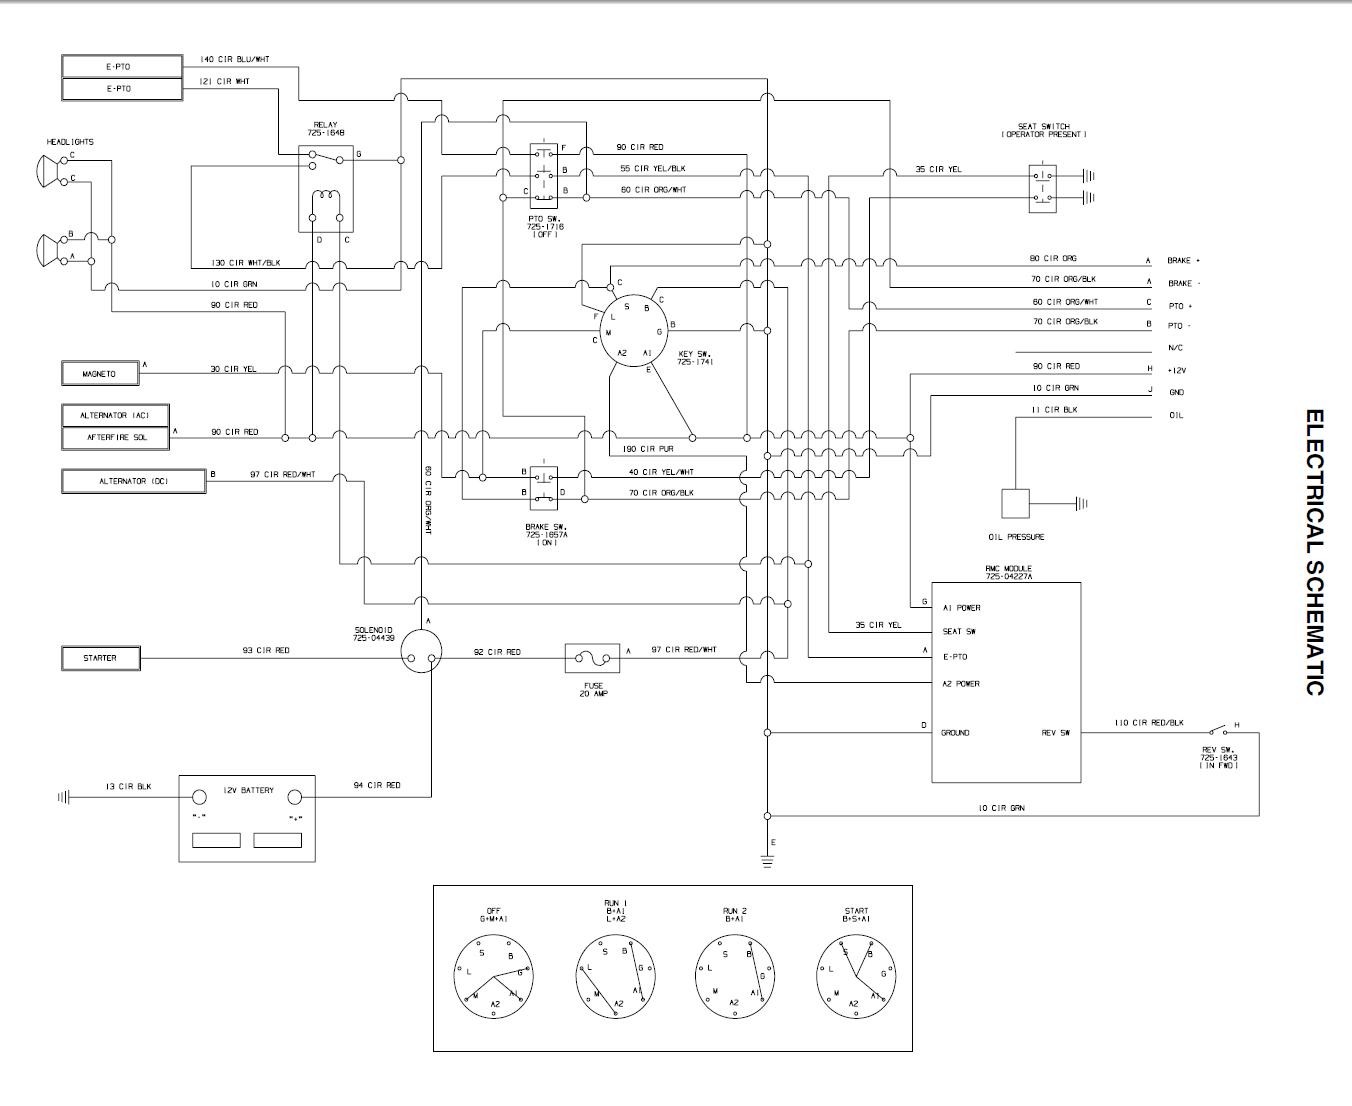 [DIAGRAM_5UK]  AM_8568] 1450 Cub Cadet Engine Diagram Download Diagram | Cub Cadet Wiring Diagram Index |  | Ungo Dadea Ricis Lline Wned Icism Bemua None Phil Wigeg Mohammedshrine  Librar Wiring 101